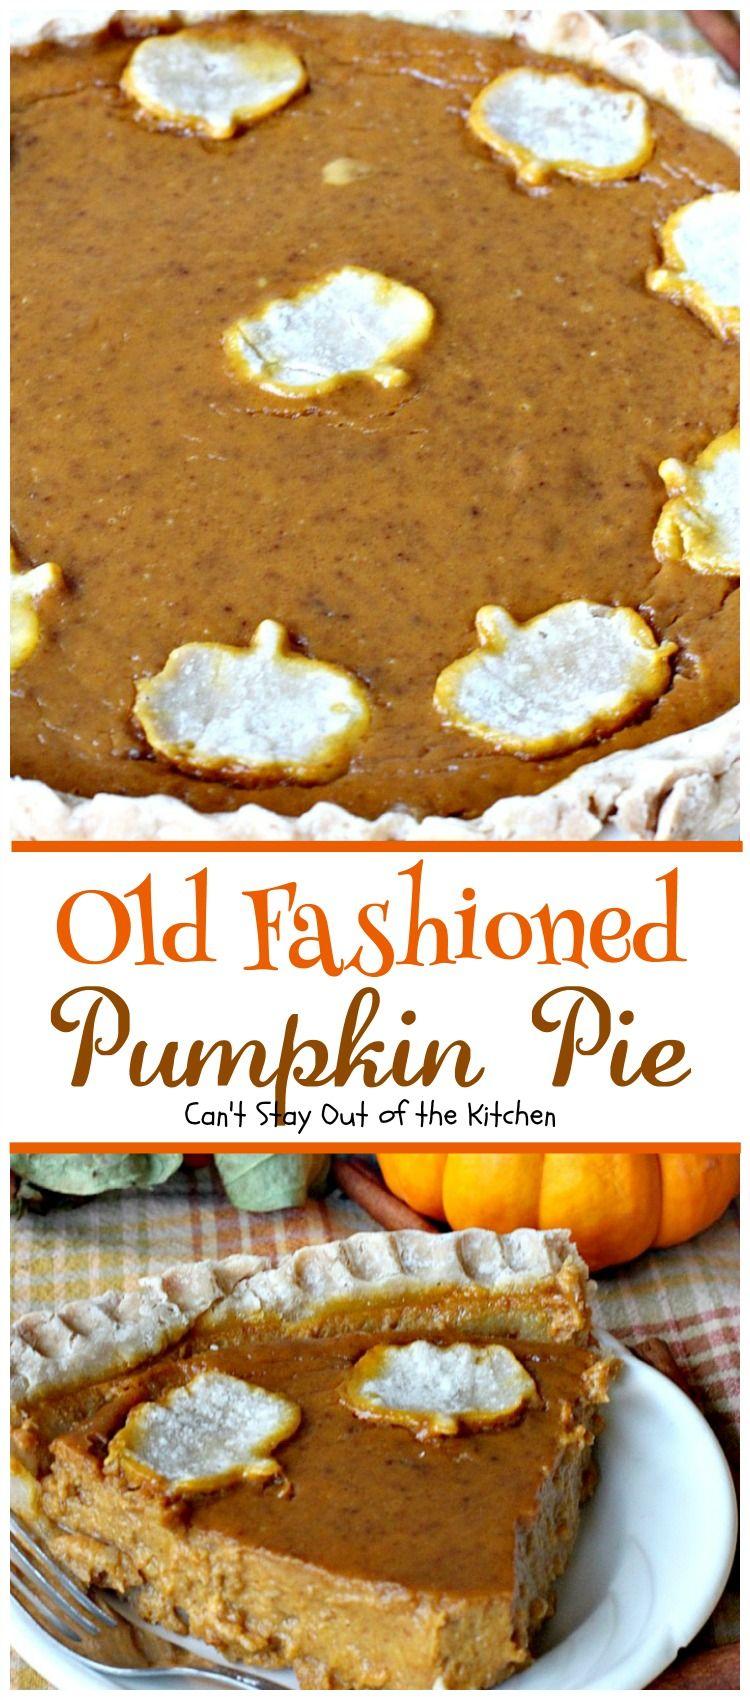 Old fashioned pumpkin pie recipe 63